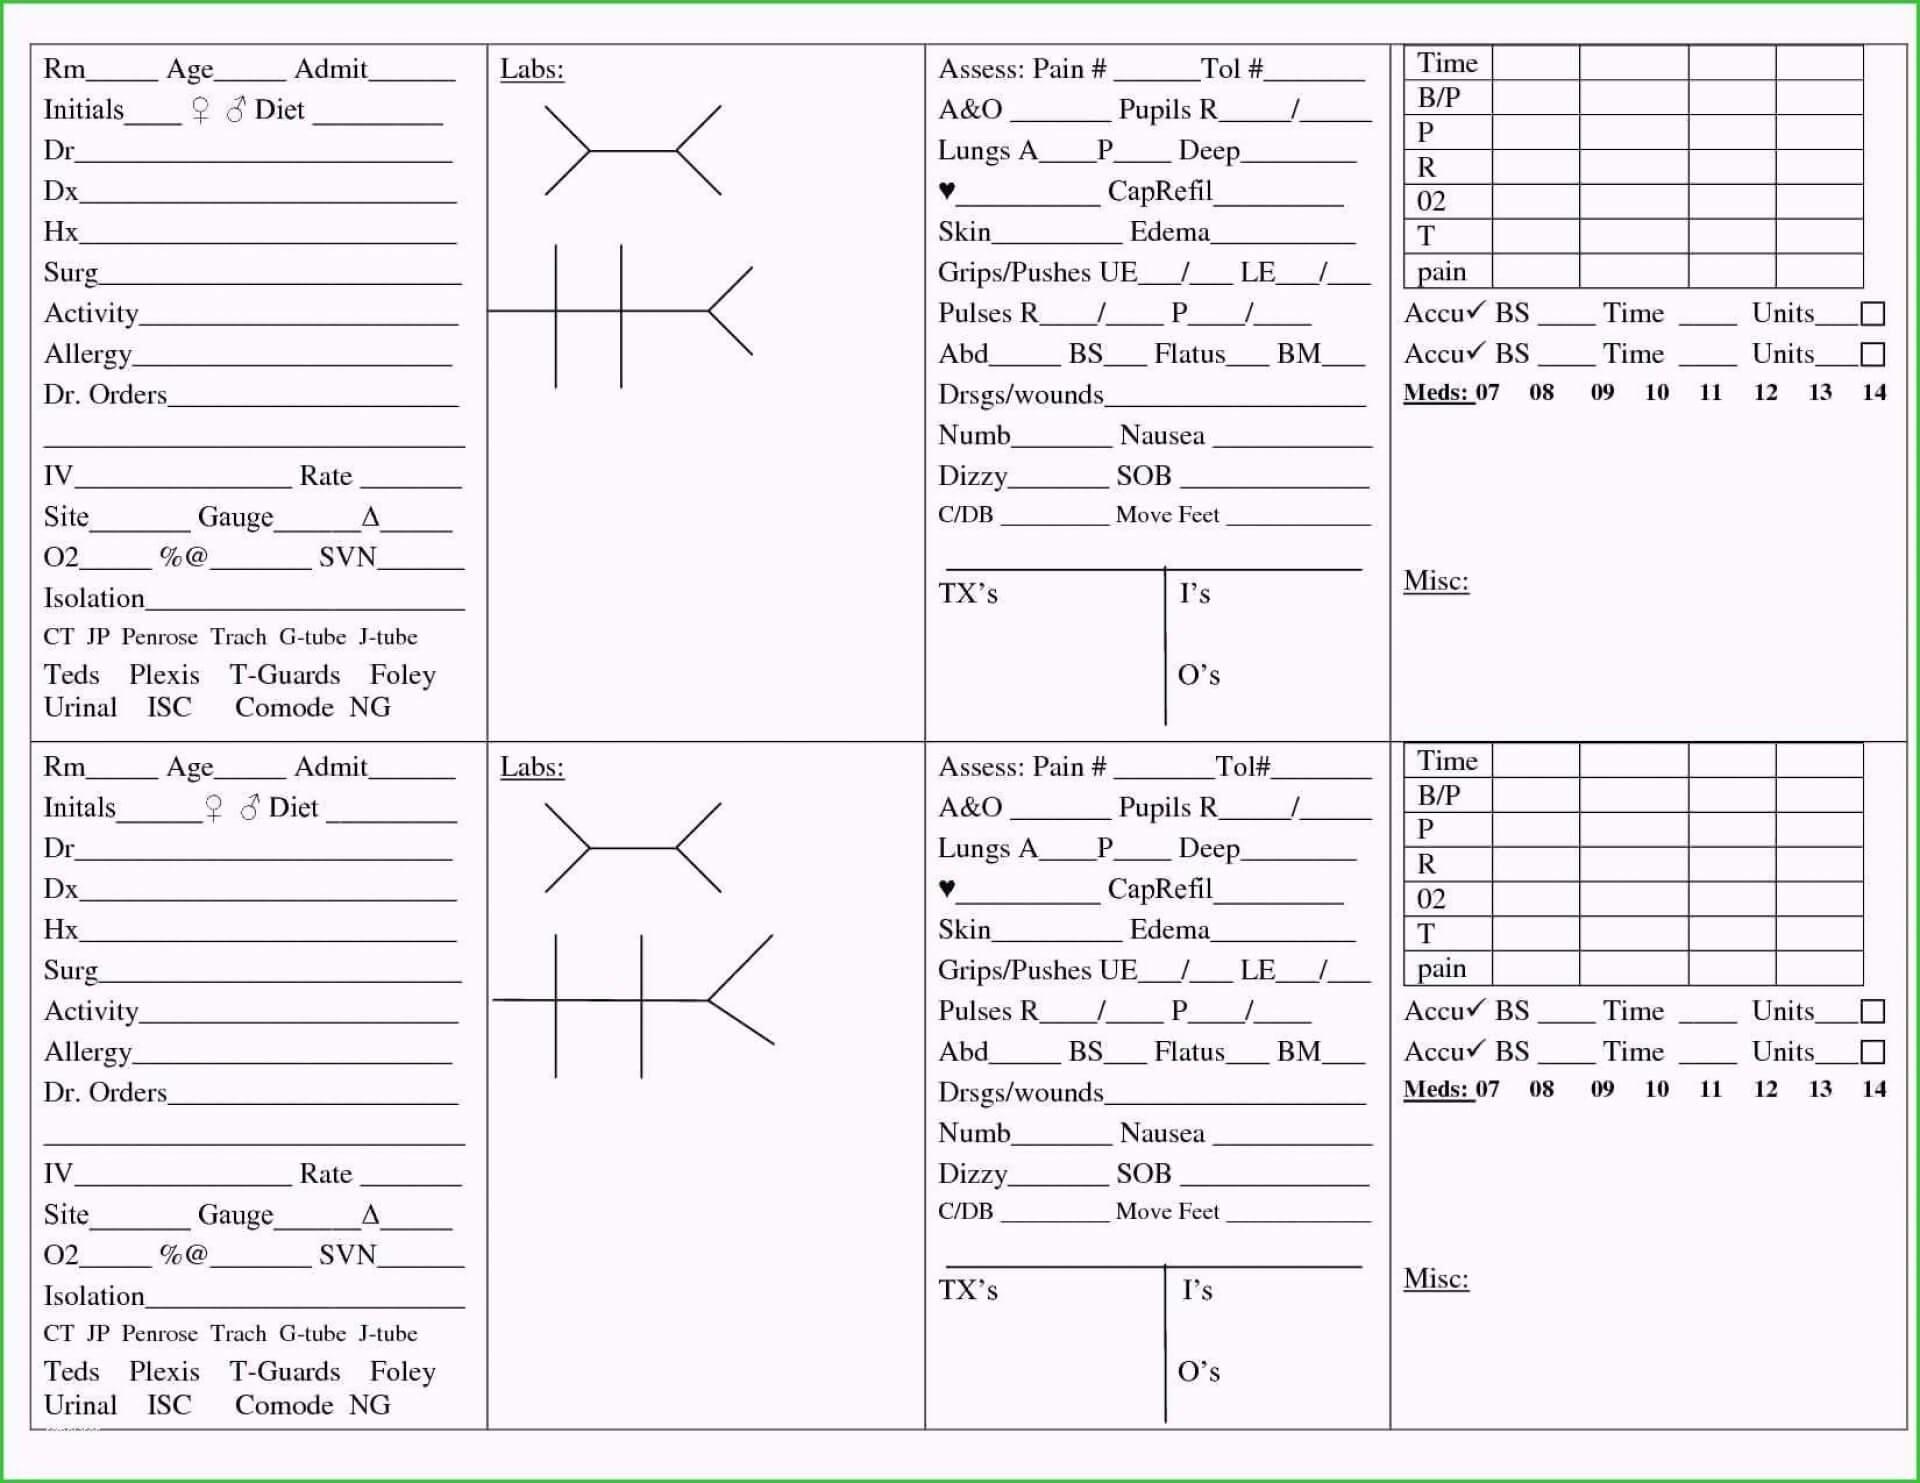 014 Nursing Shift Report Template Unforgettable Ideas Sheet Regarding Nurse Shift Report Sheet Template